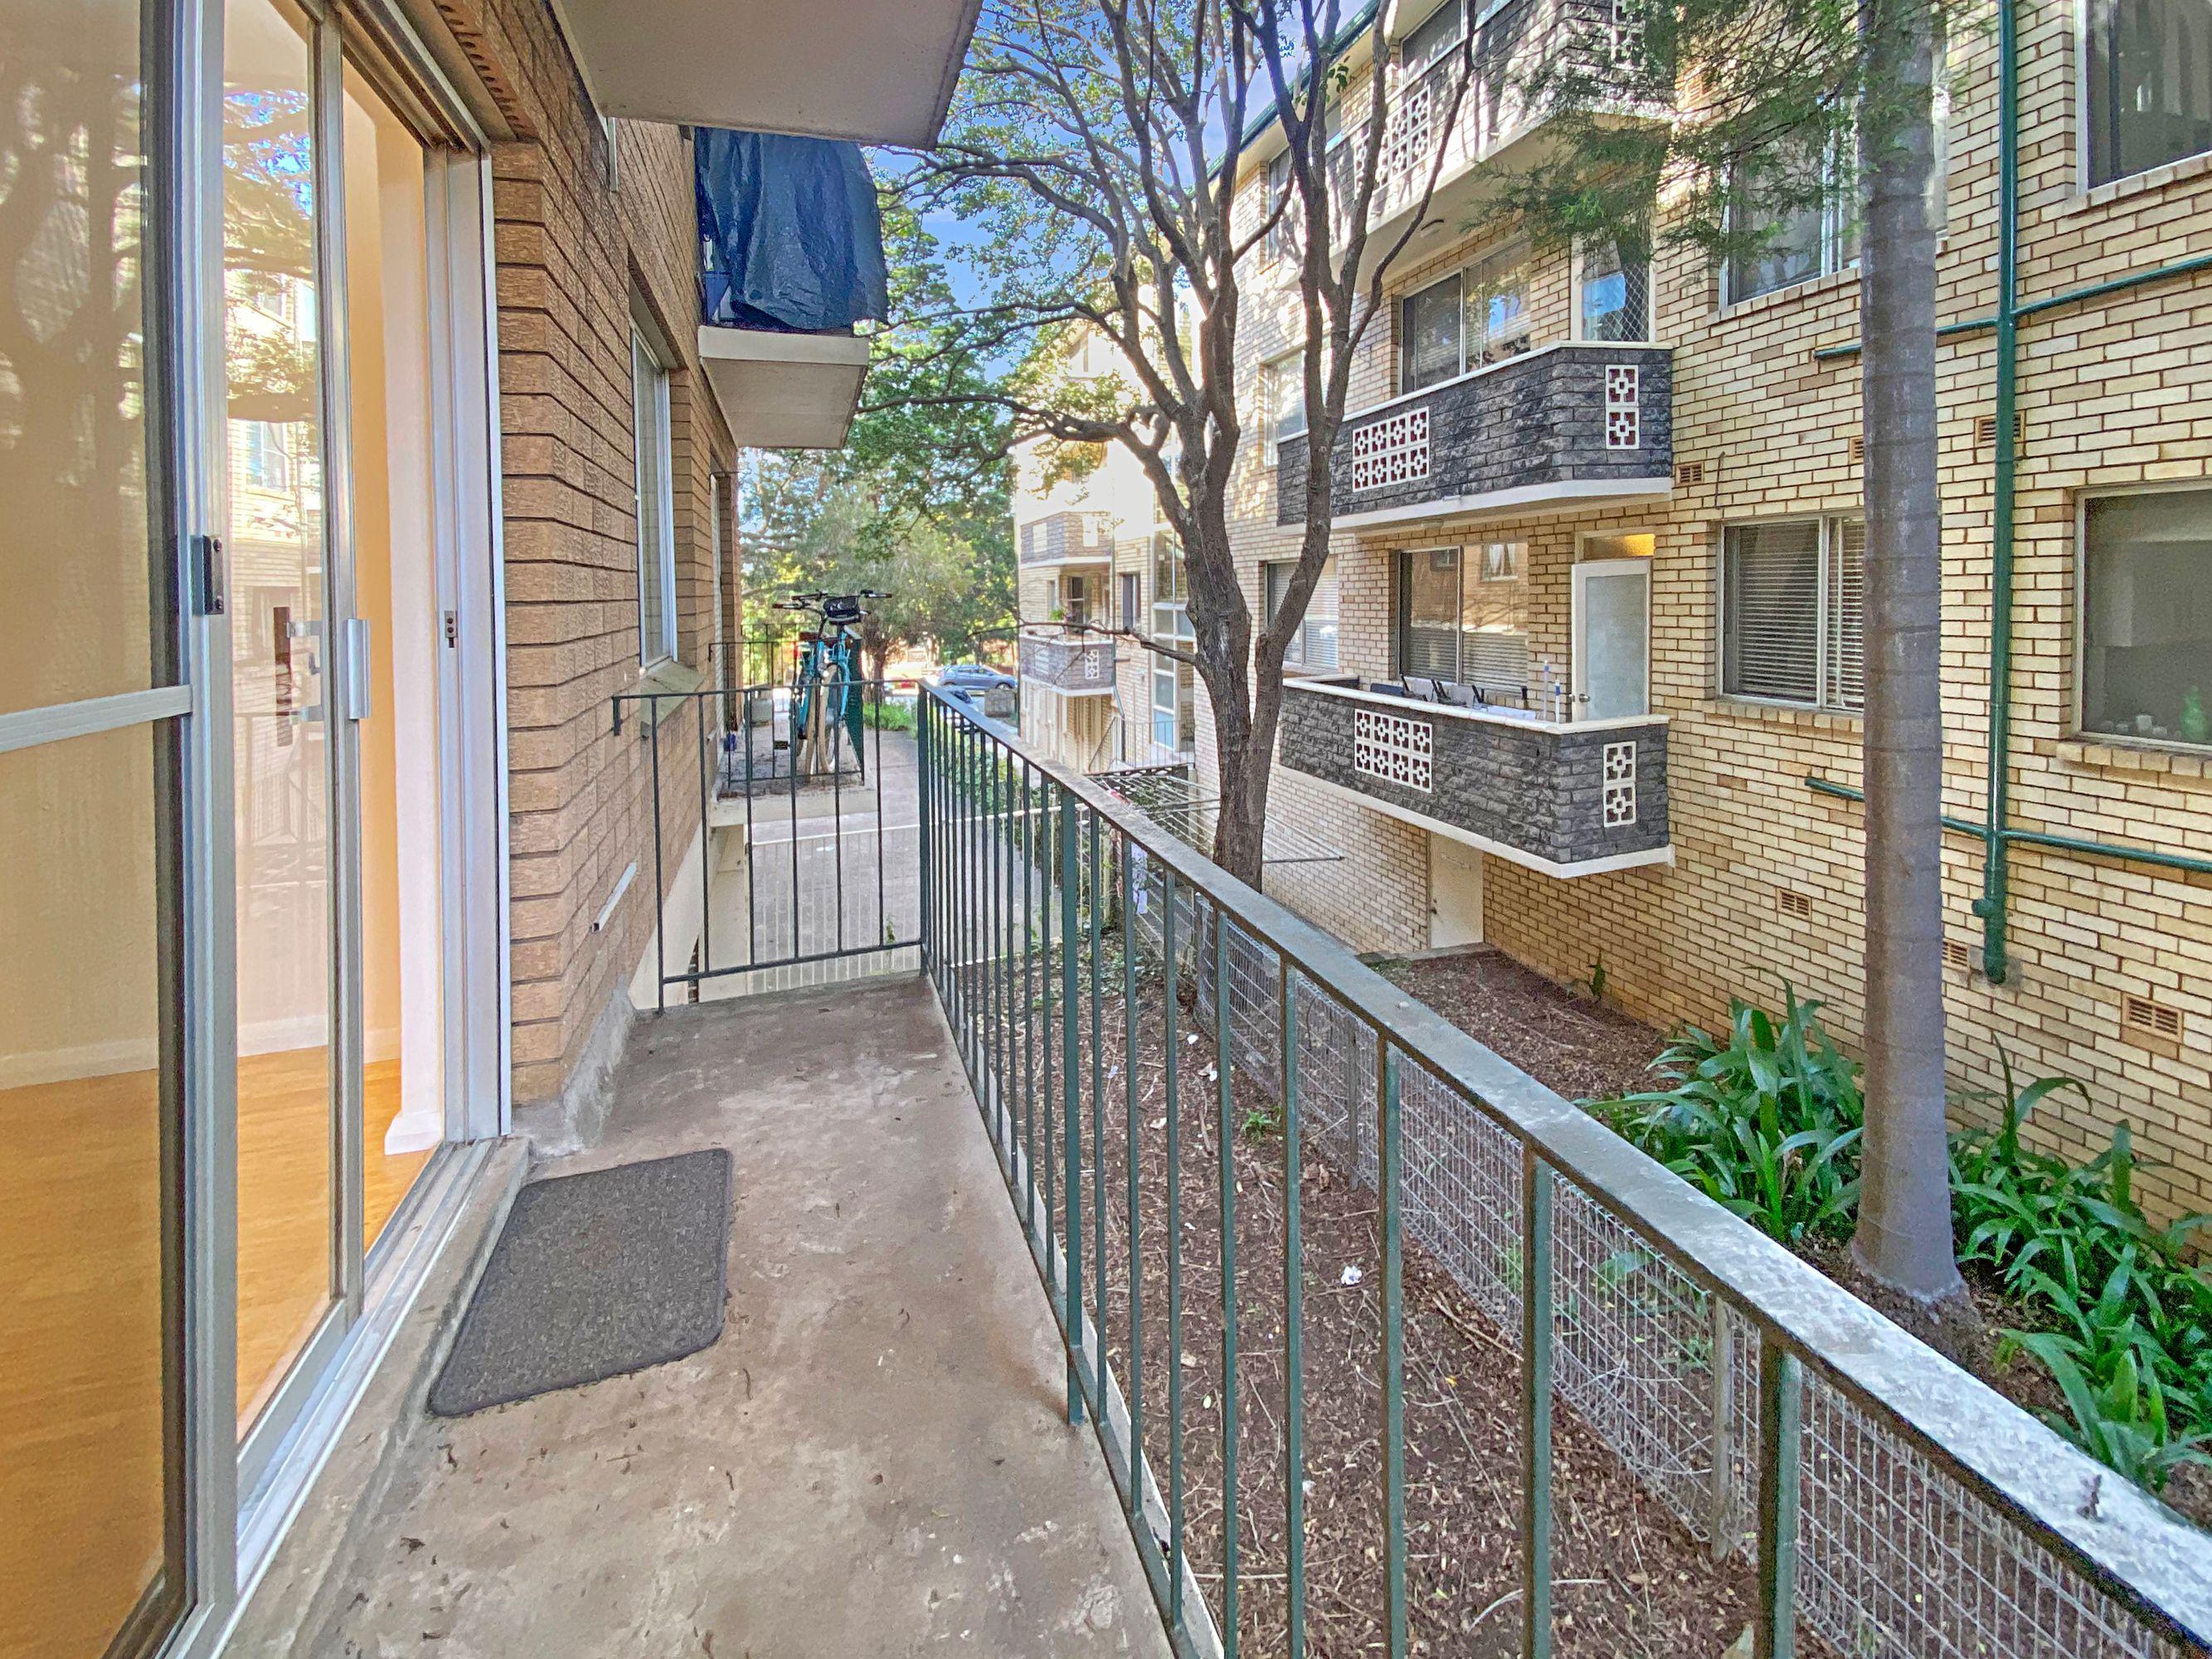 2/23 Wharf Road, Gladesville, NSW 2111